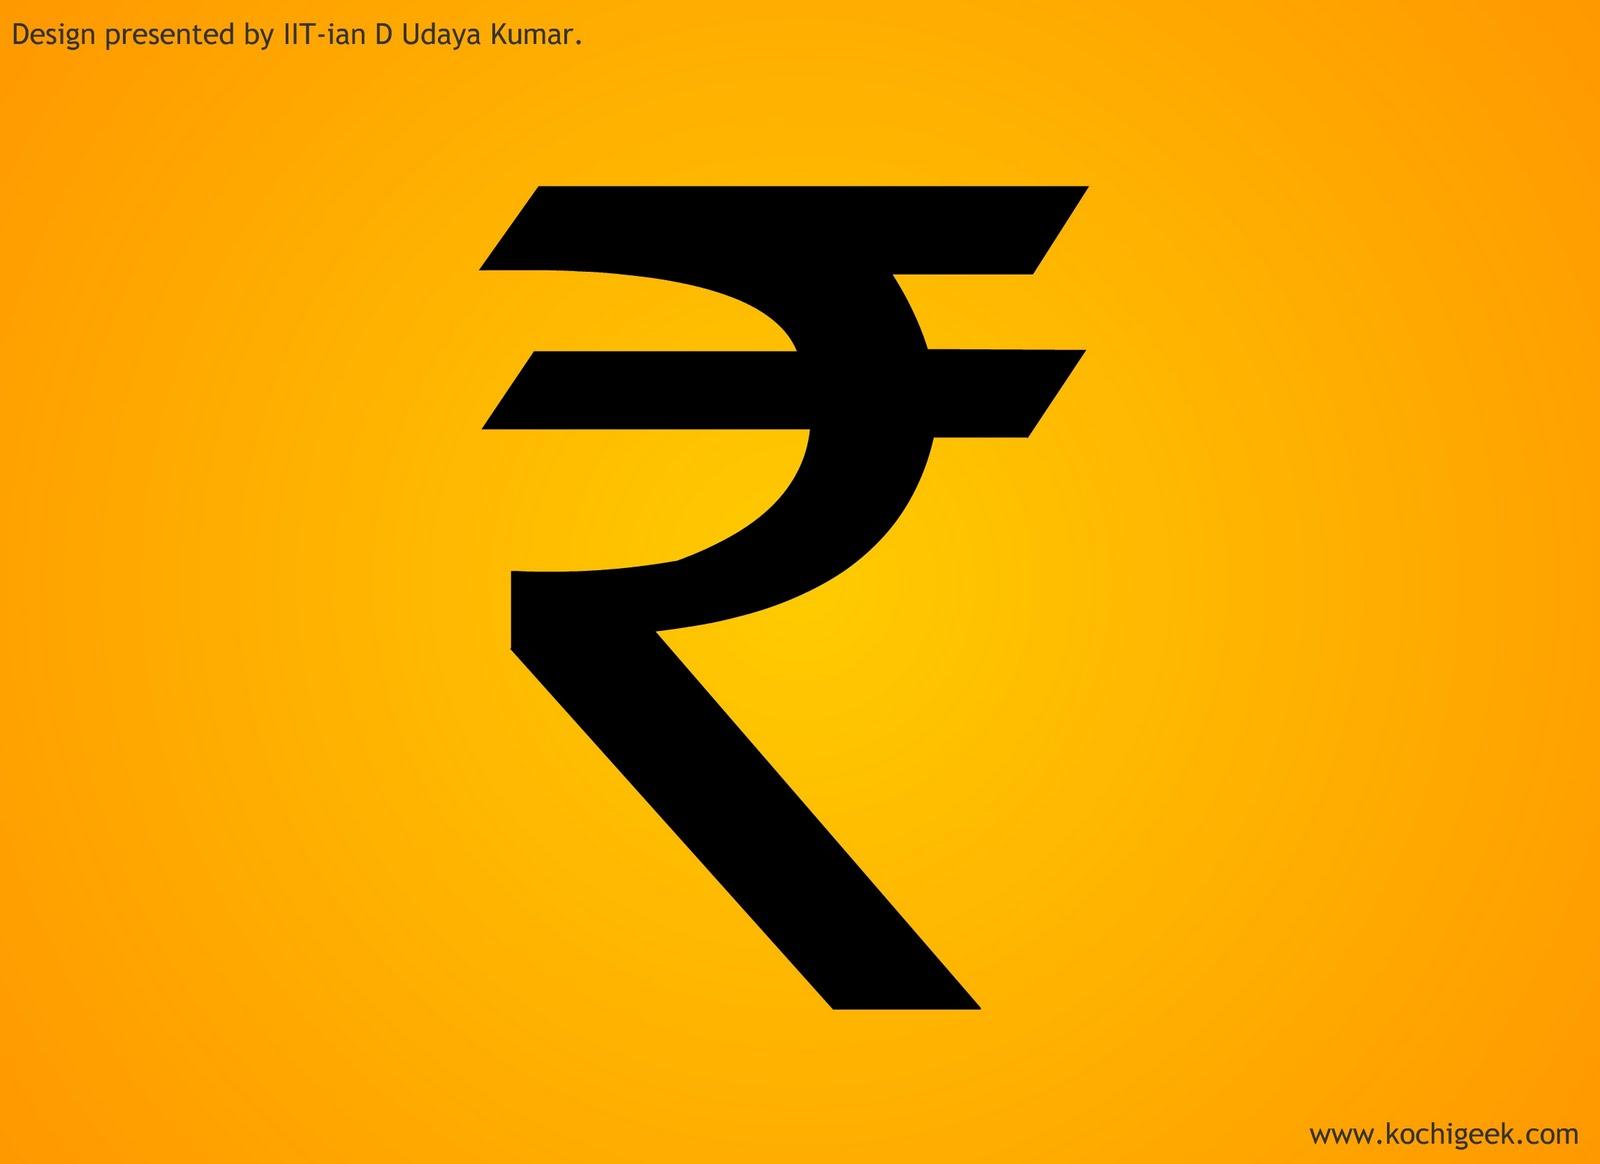 Symbol of rupees indian rupee symbol inr kochigeek geekin symbol of rupees biocorpaavc Choice Image